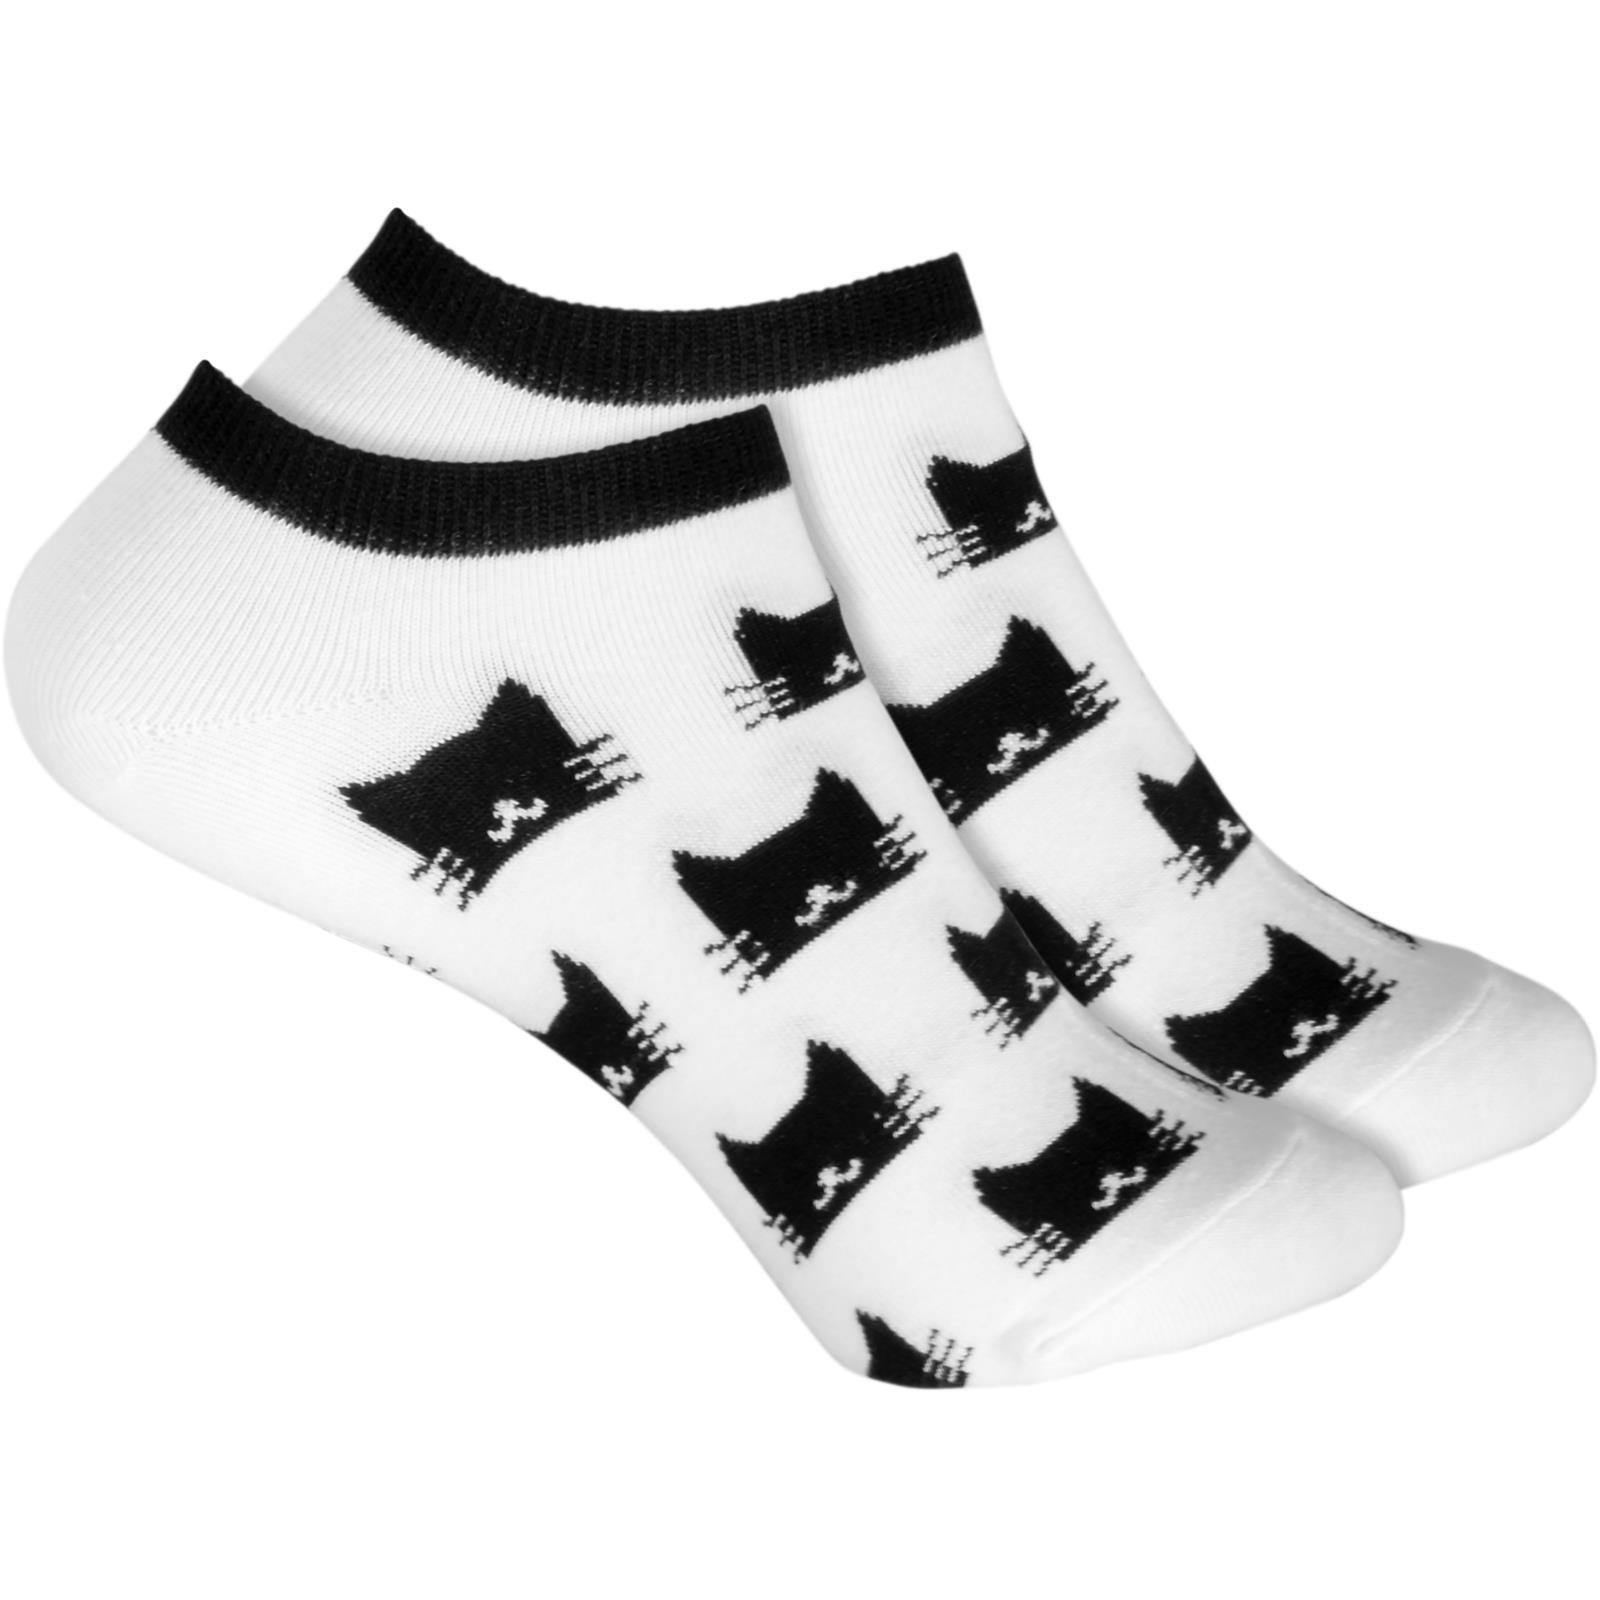 cosey dünne Socken Sneaker Katzen weiß 33-40 2 Paar Baumwolle atmungsaktiv weich